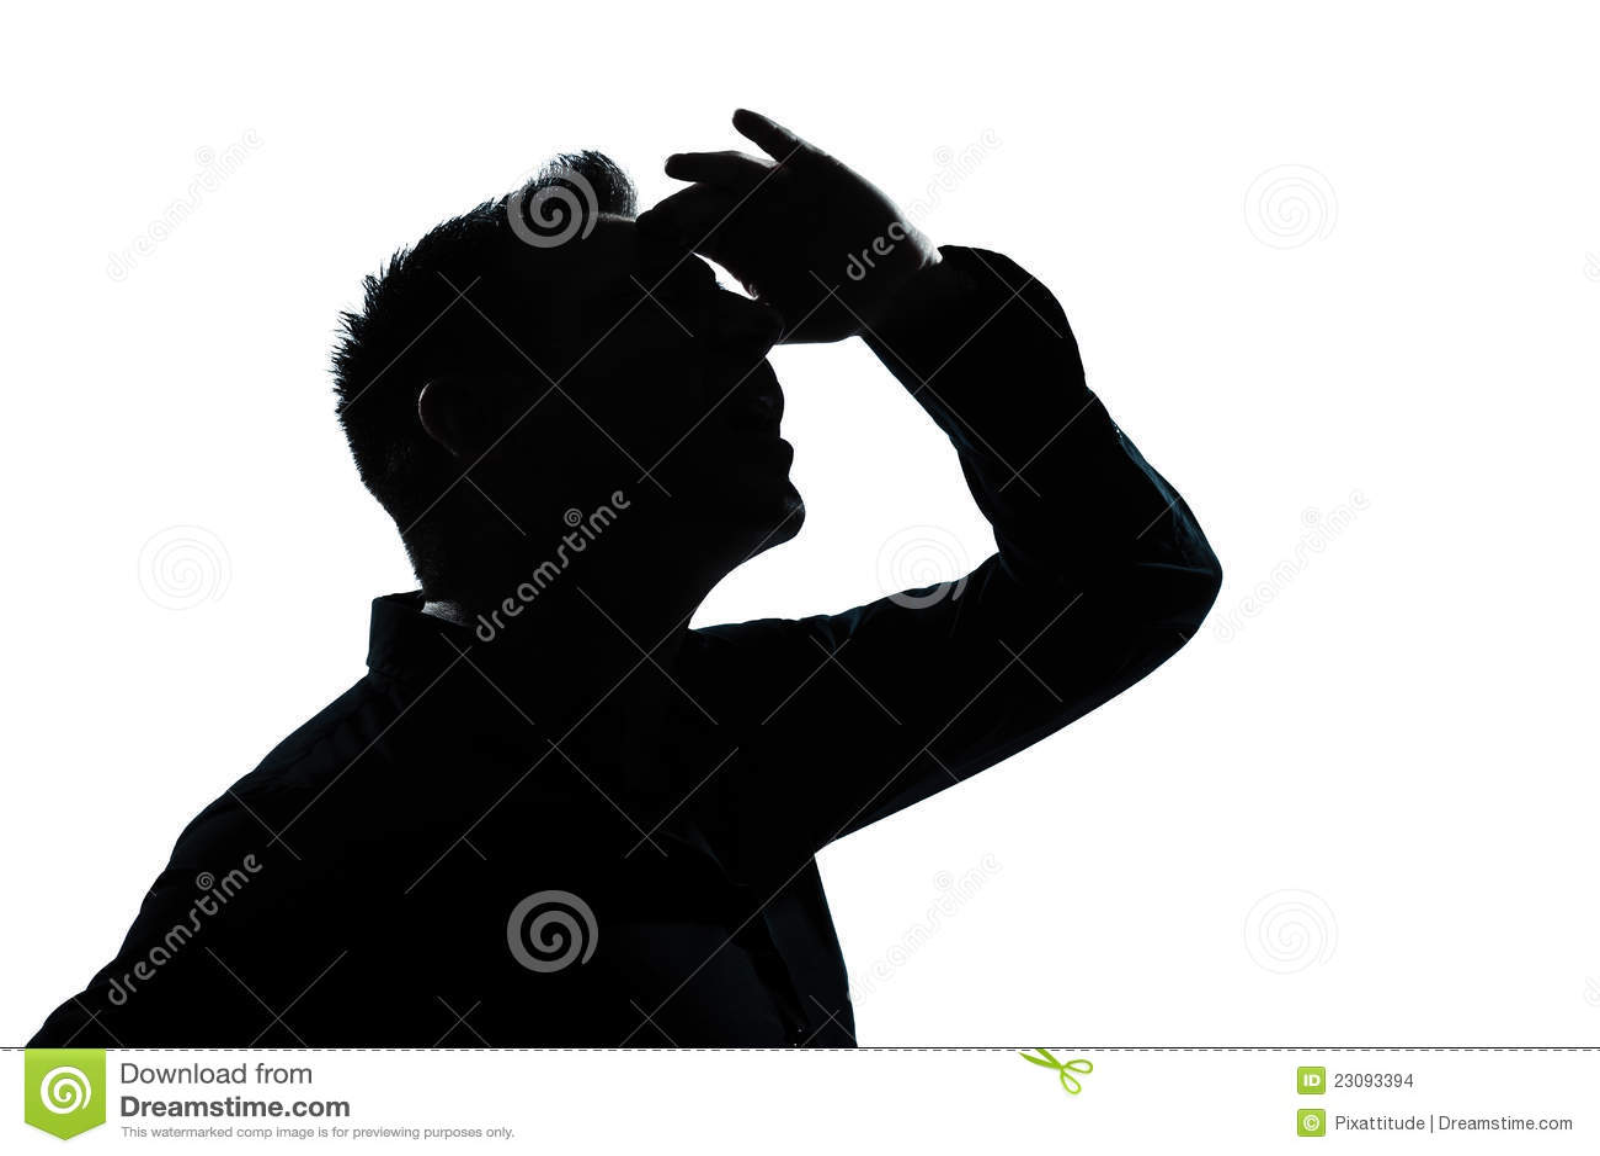 Quarterback Clipart Images